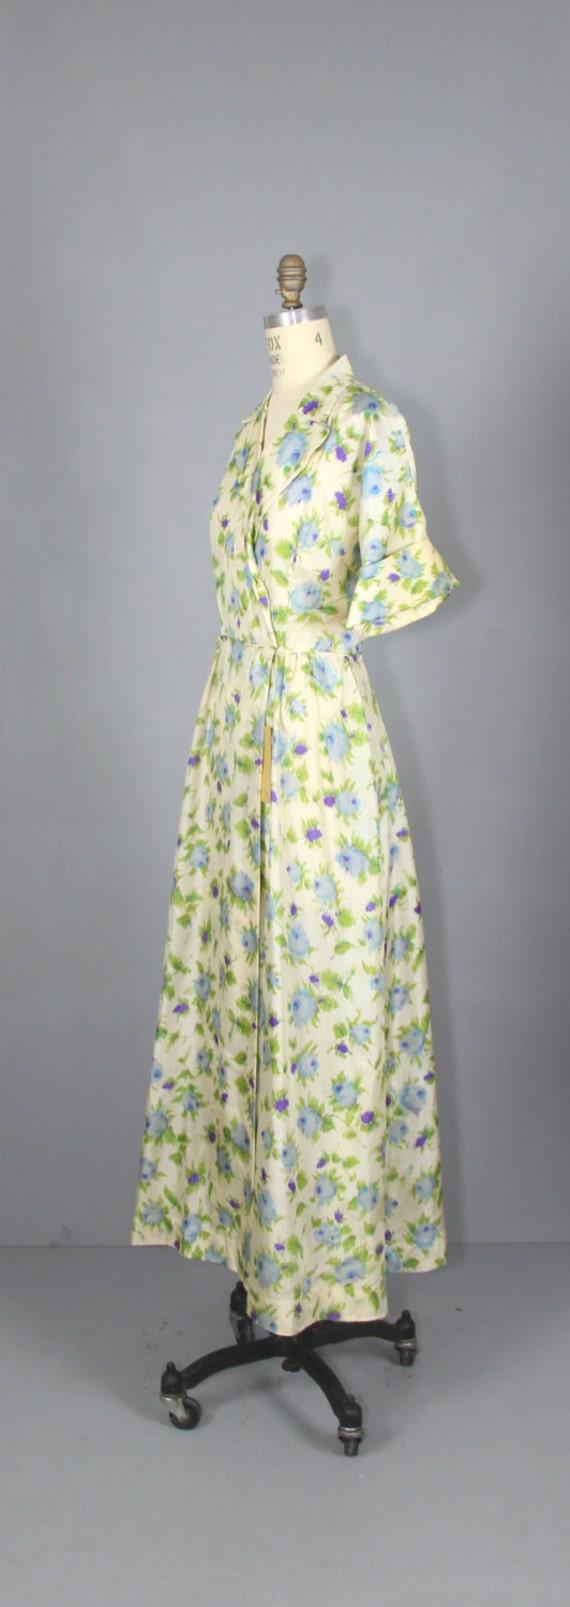 1940s robe / silk robe / dressing gown / SUGAR PL… - image 3